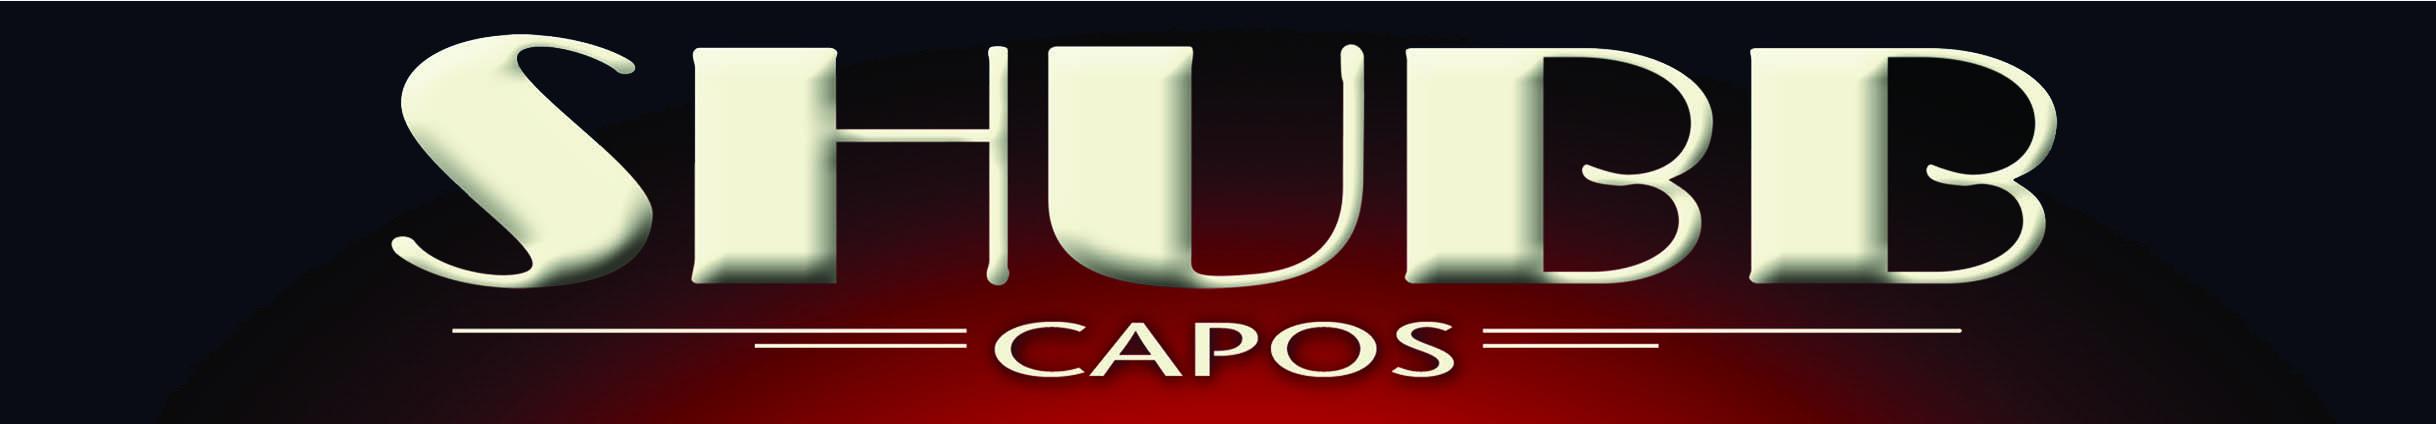 Shubb Capo Artist since 2019